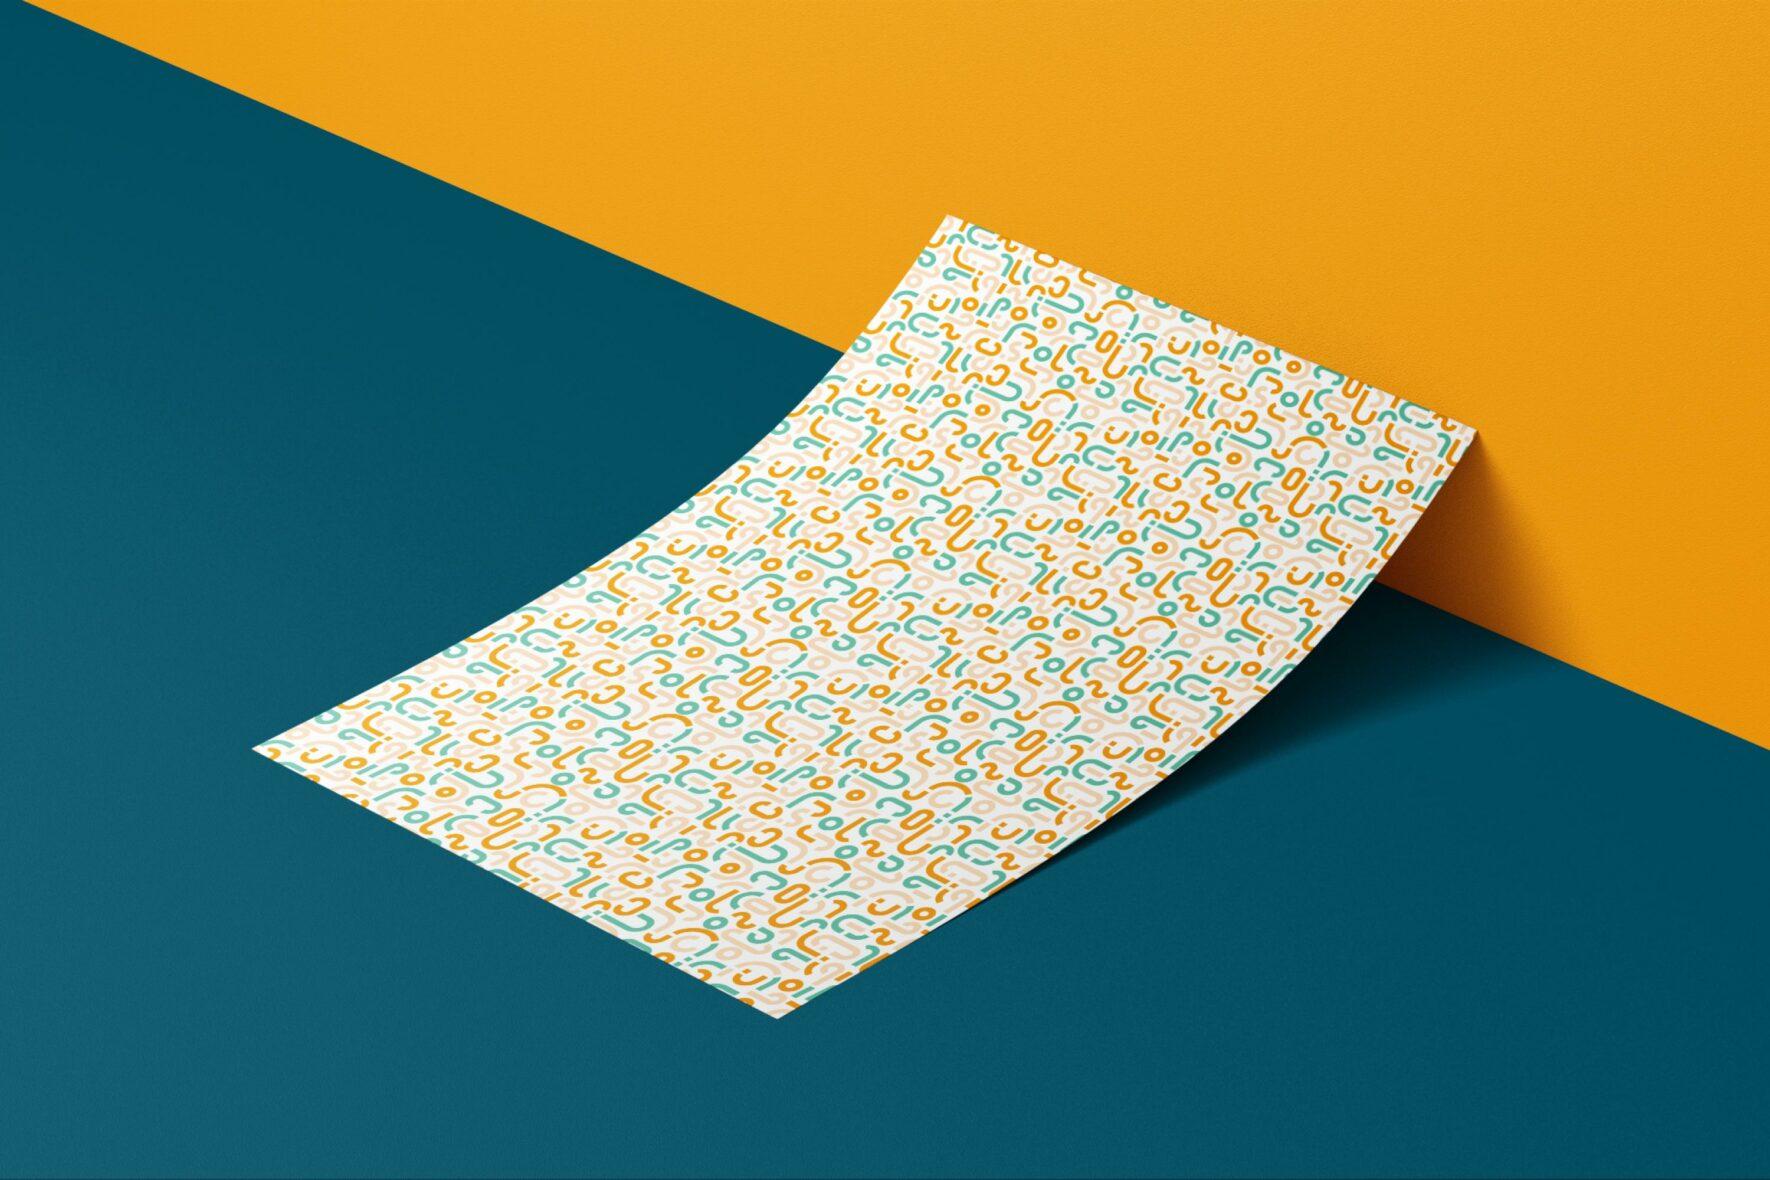 jumenga-Briefpapier-Corporate-Design-FORMLOS-Berlin-Print-2